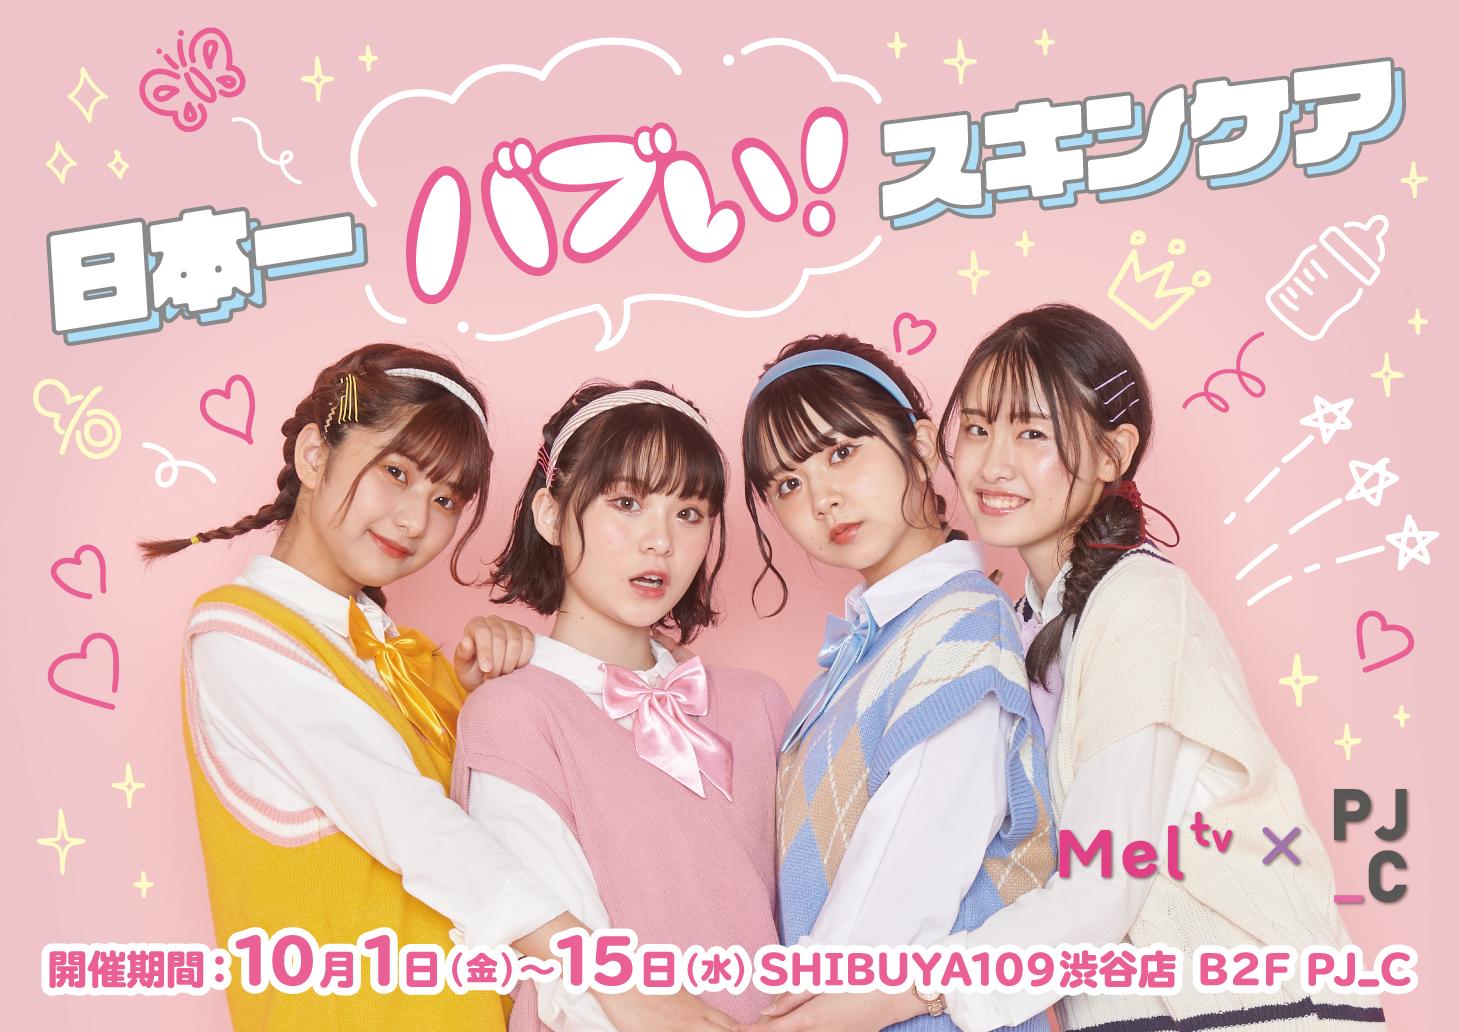 大人気YouTube番組「MelTV」とPJ_Cがコラボ決定!!①